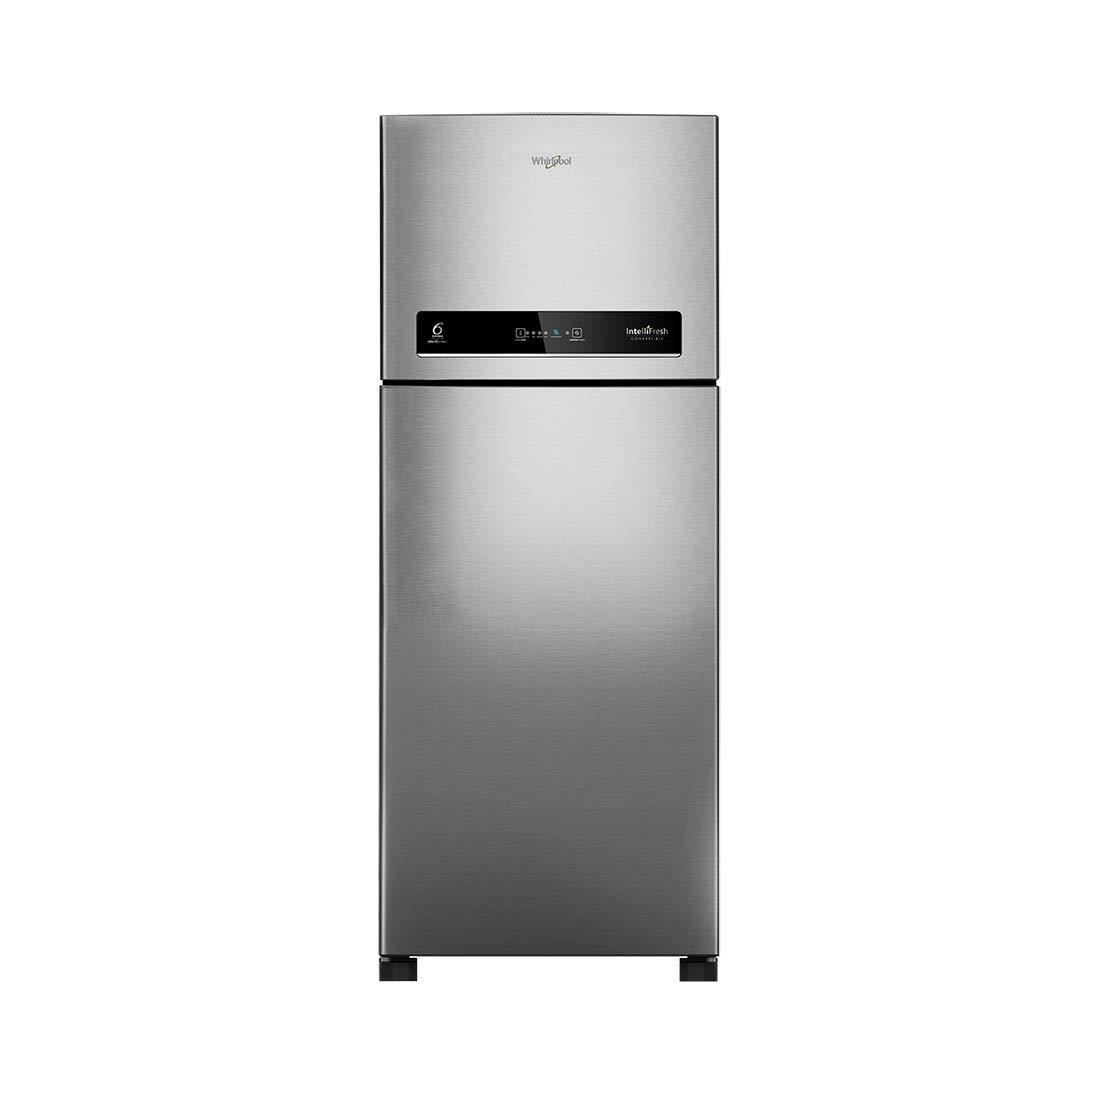 Frost-Free Refrigerator